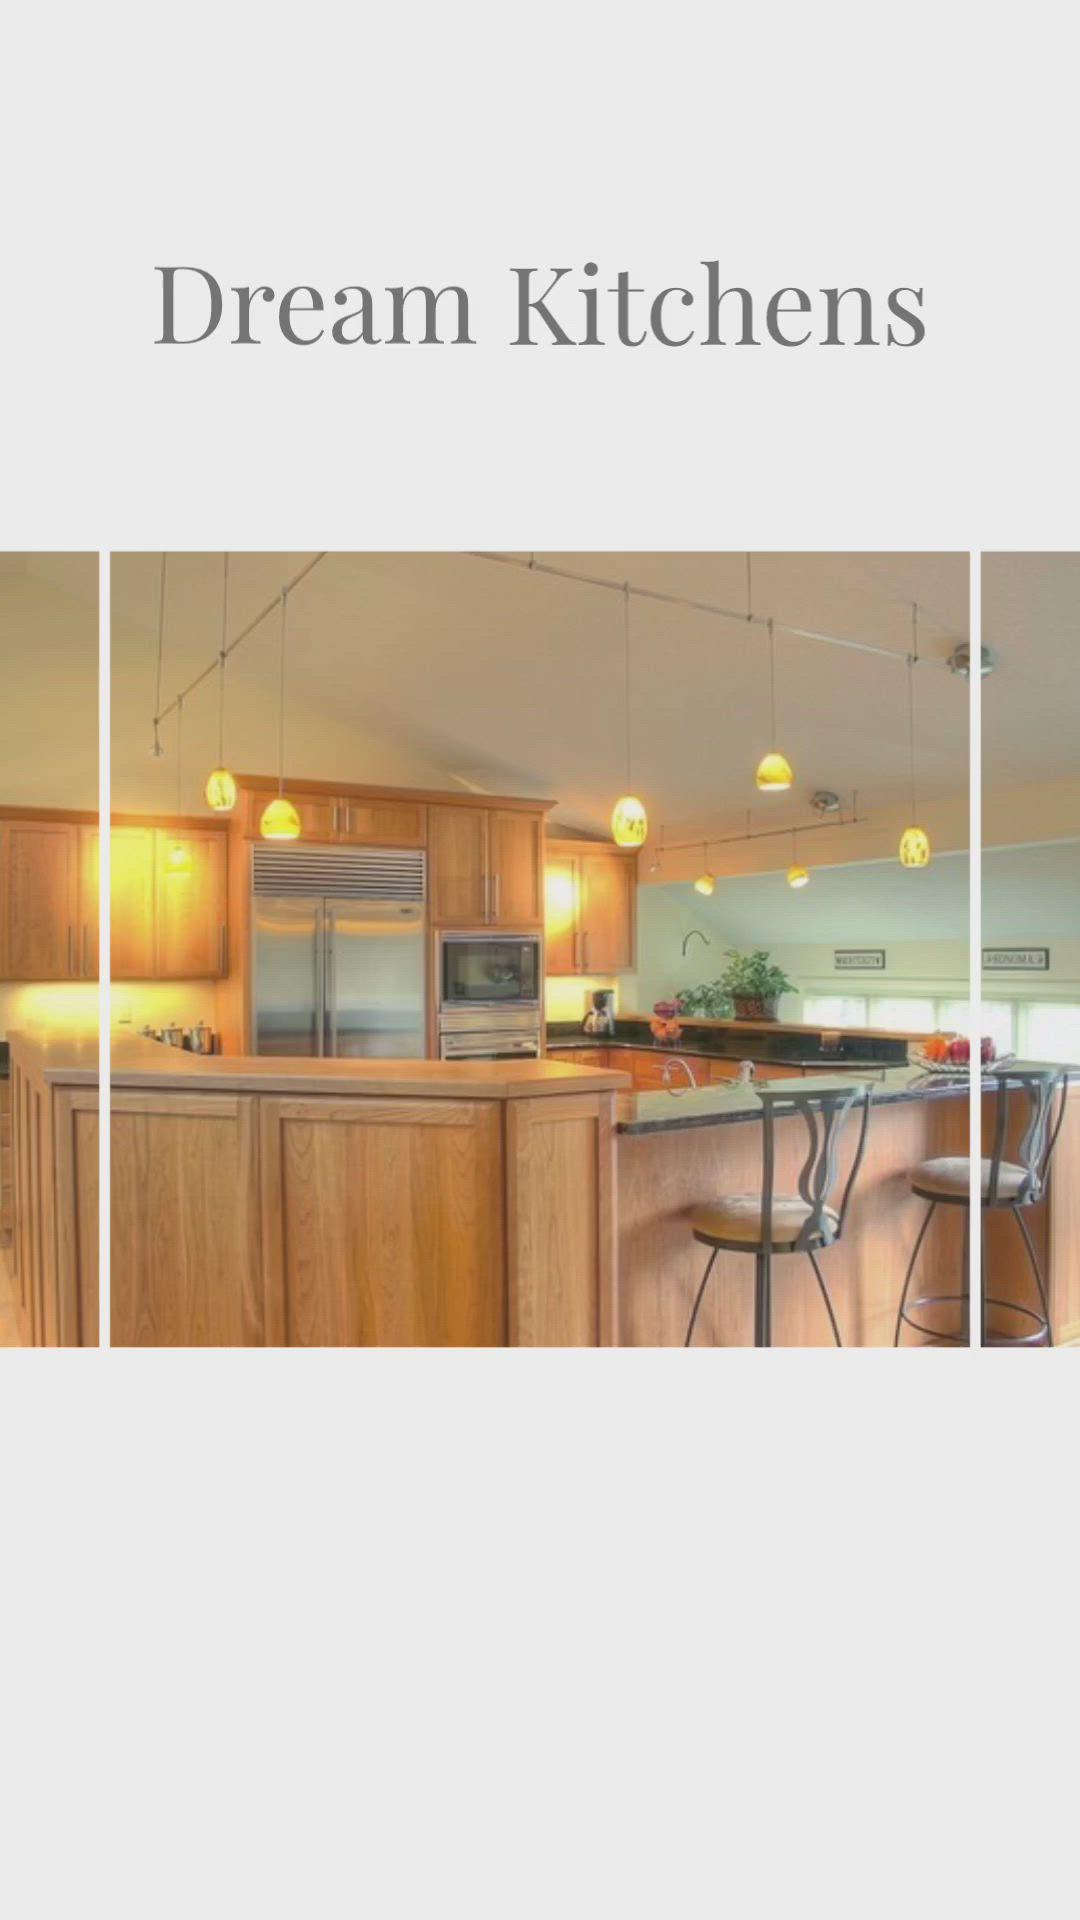 Windhanm Nh Remodel Video In 2020 Modern Kitchen Design White Kitchen Cabinets Farmhouse Kitchen